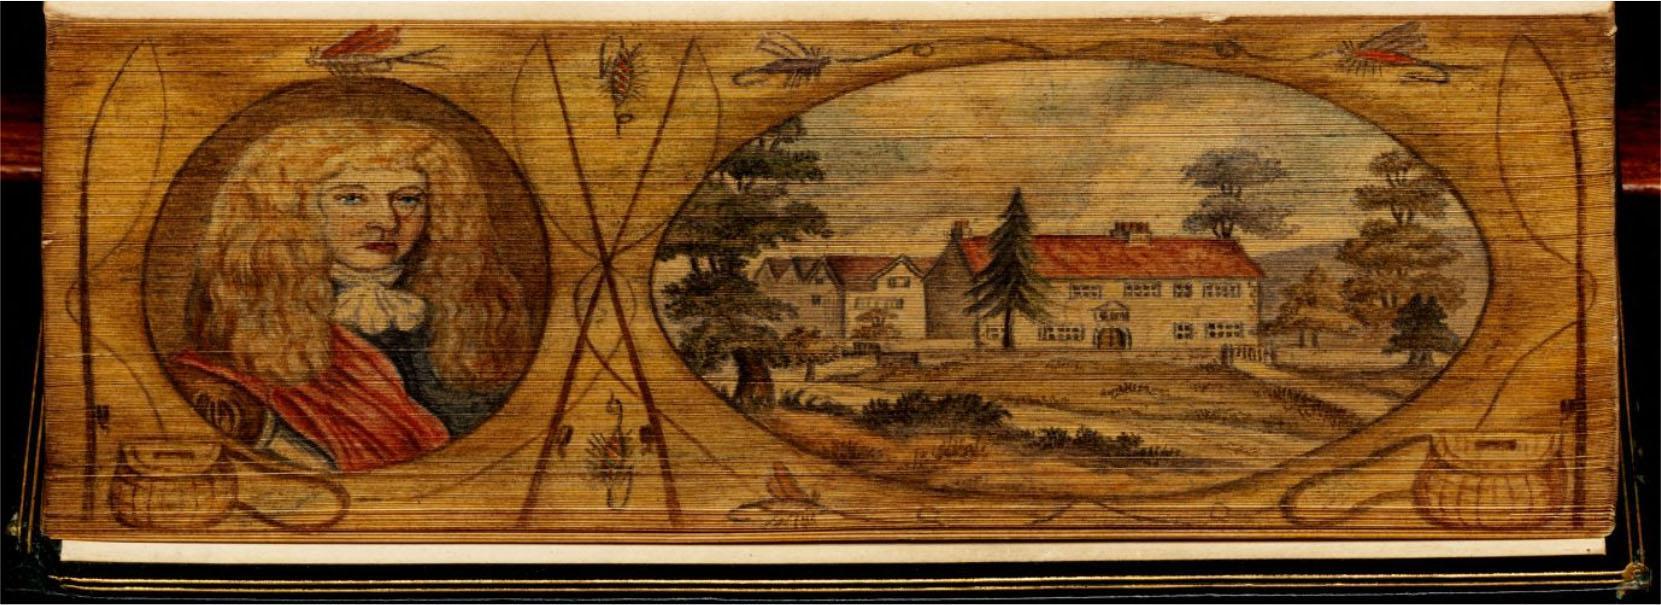 cotton-beresford-hall.jpg